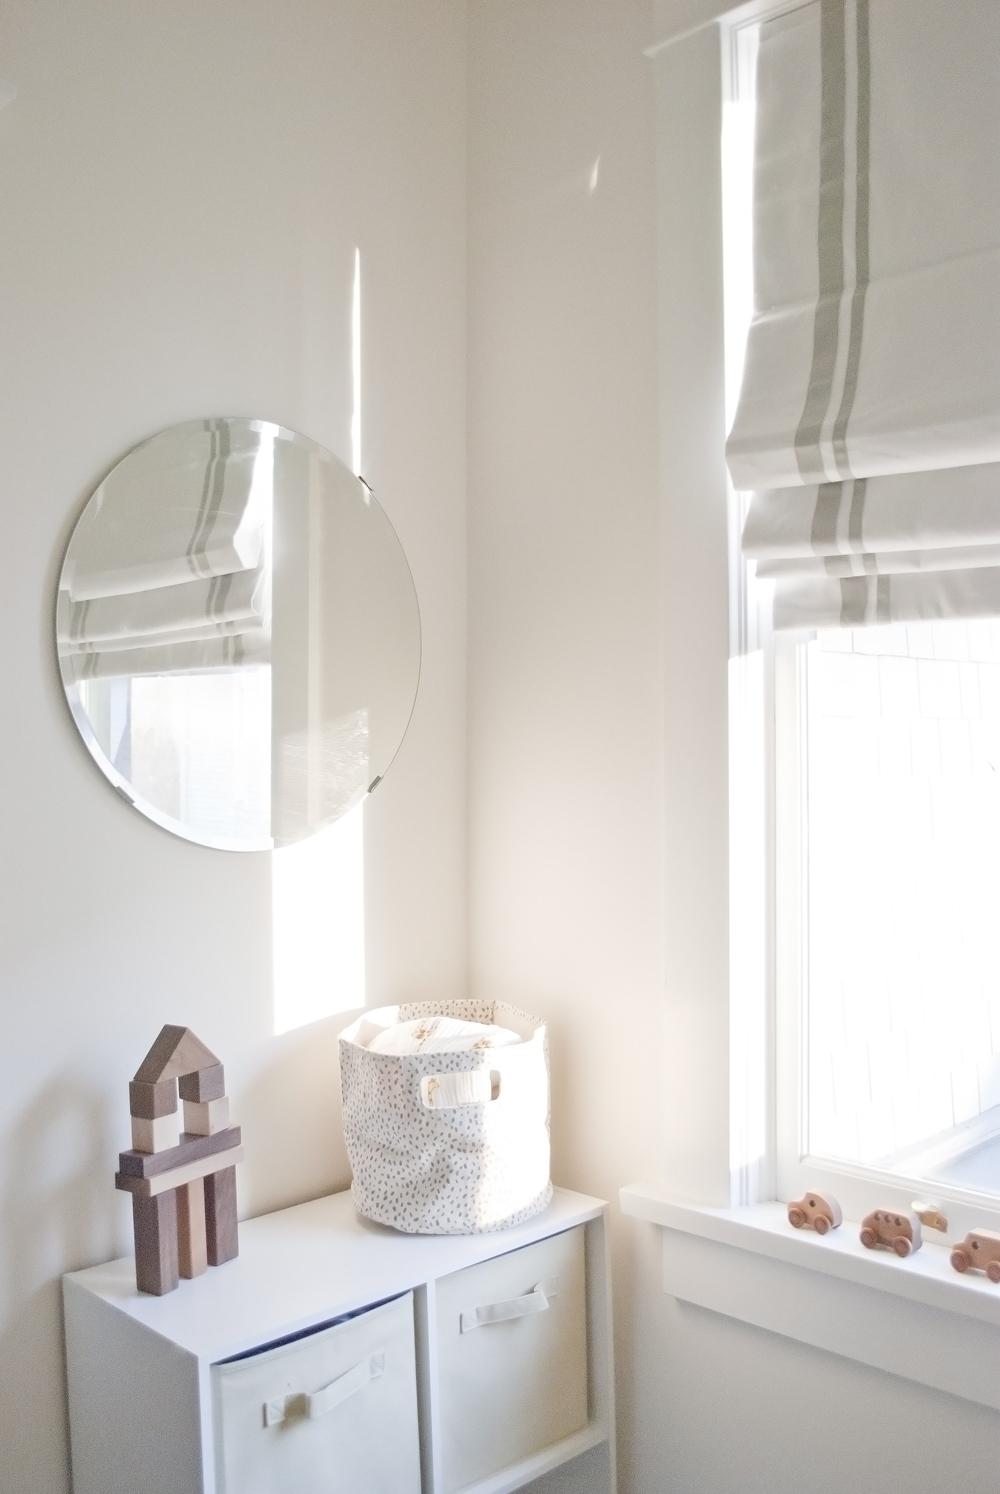 jasper-mirror-corner